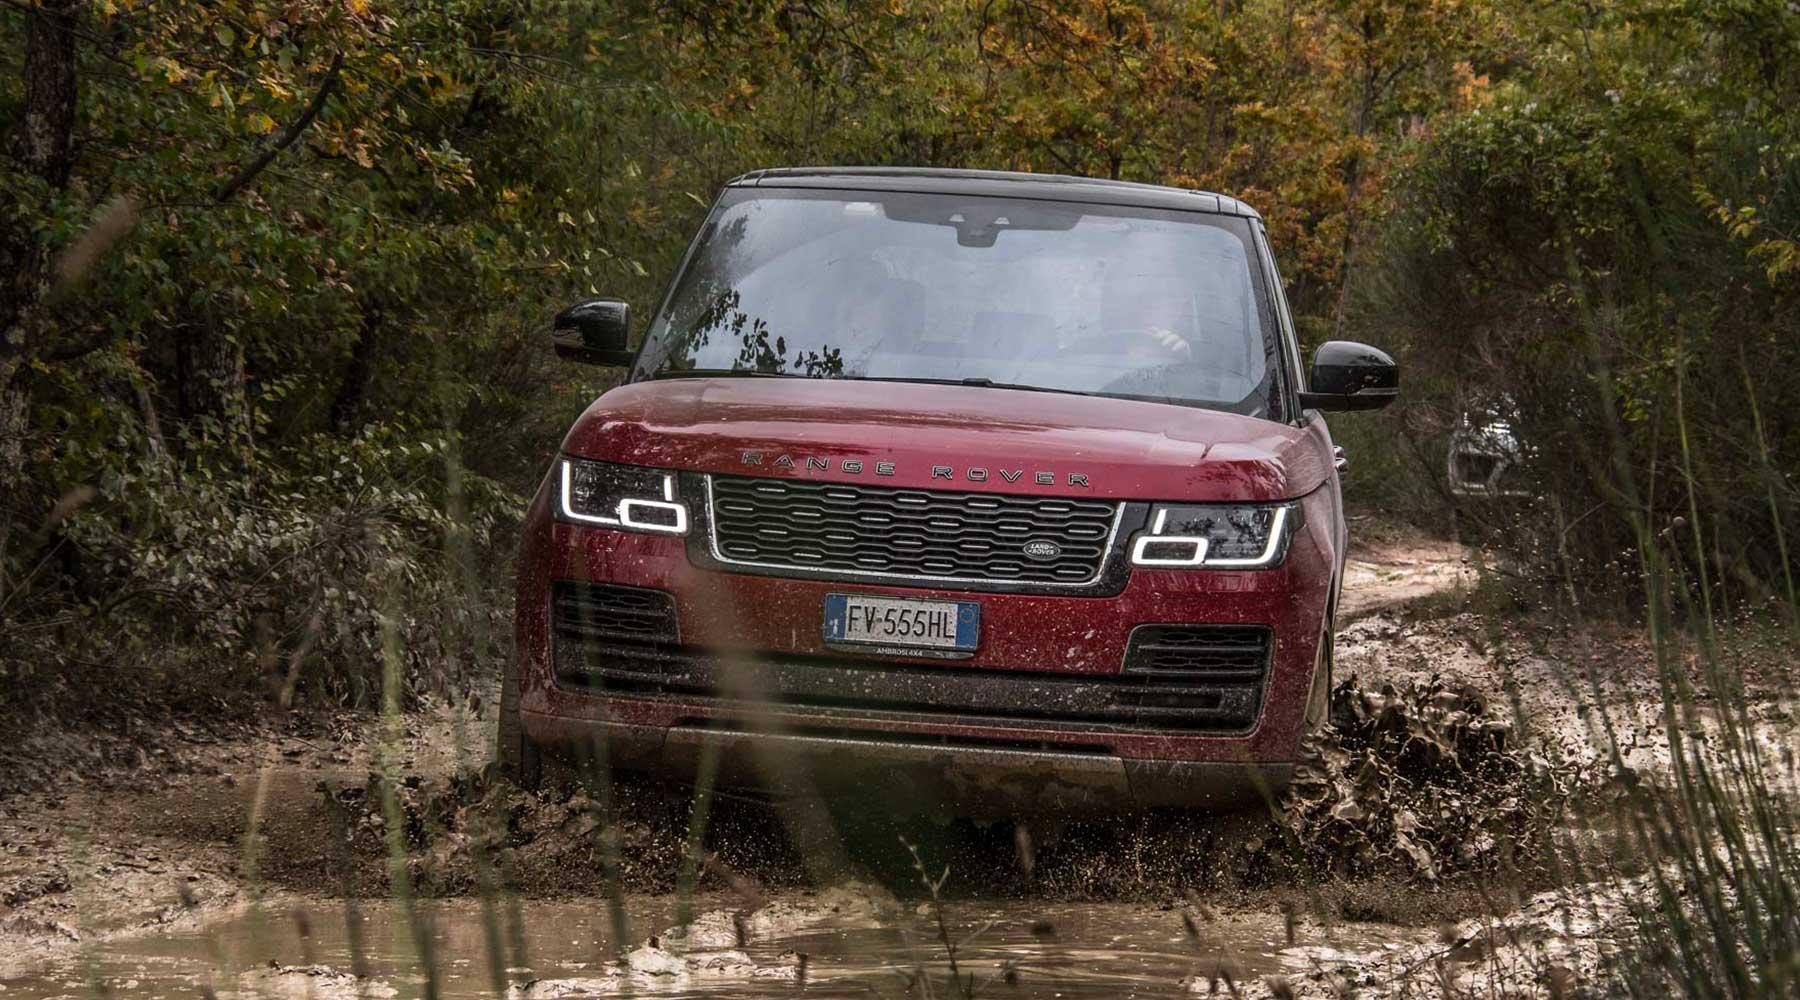 Land-Rover-Tour-TIRRENO-ADRIATICA-2020-Land-Rover-Experience-Italia